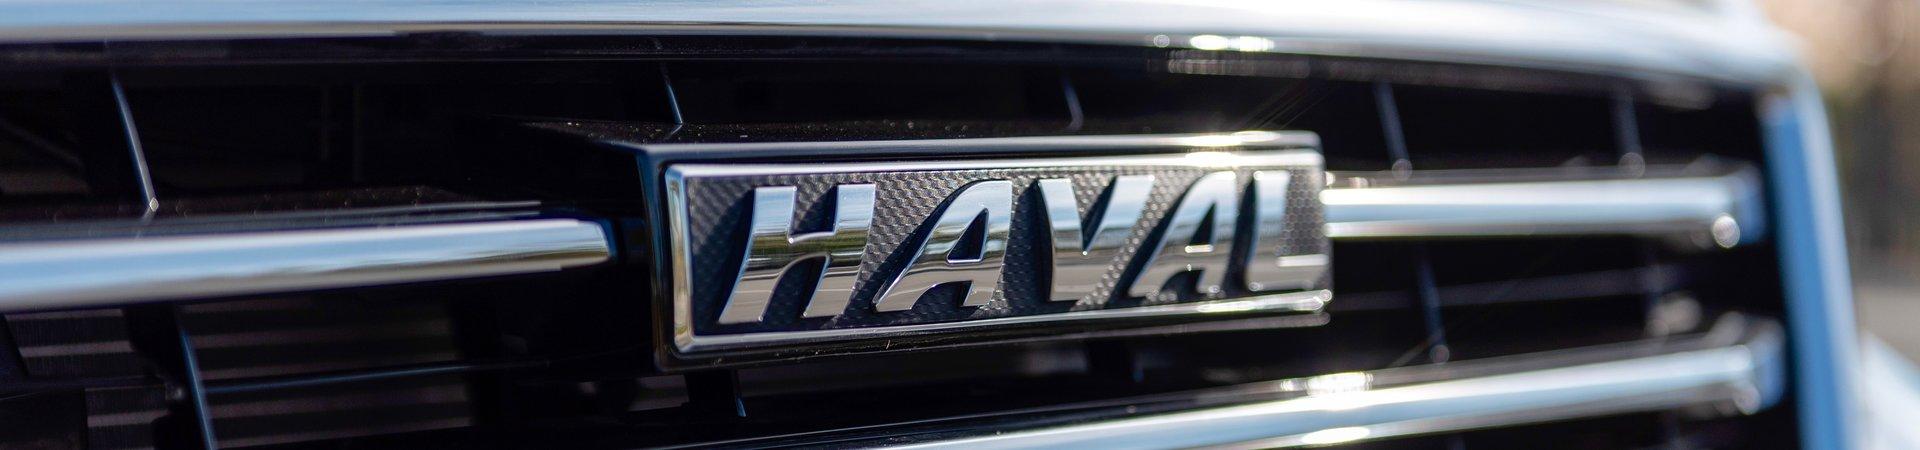 Haval SUV Parts & Service Perth